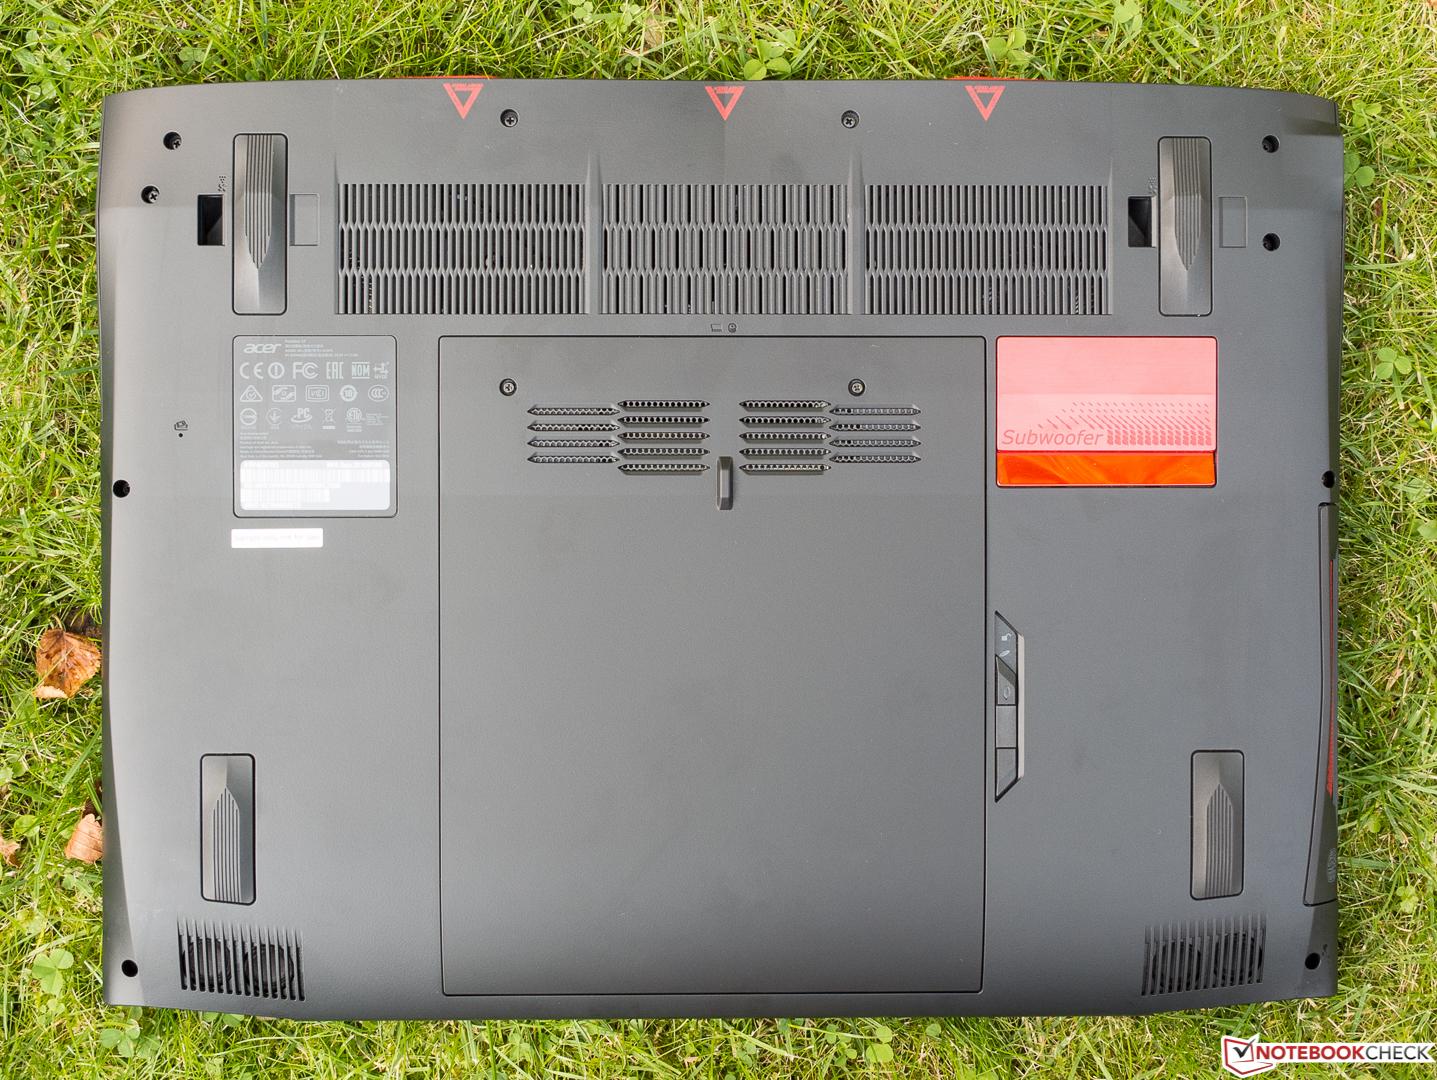 Acer Predator 17 7700hq Gtx 1070 Uhd Laptop Review G9 793